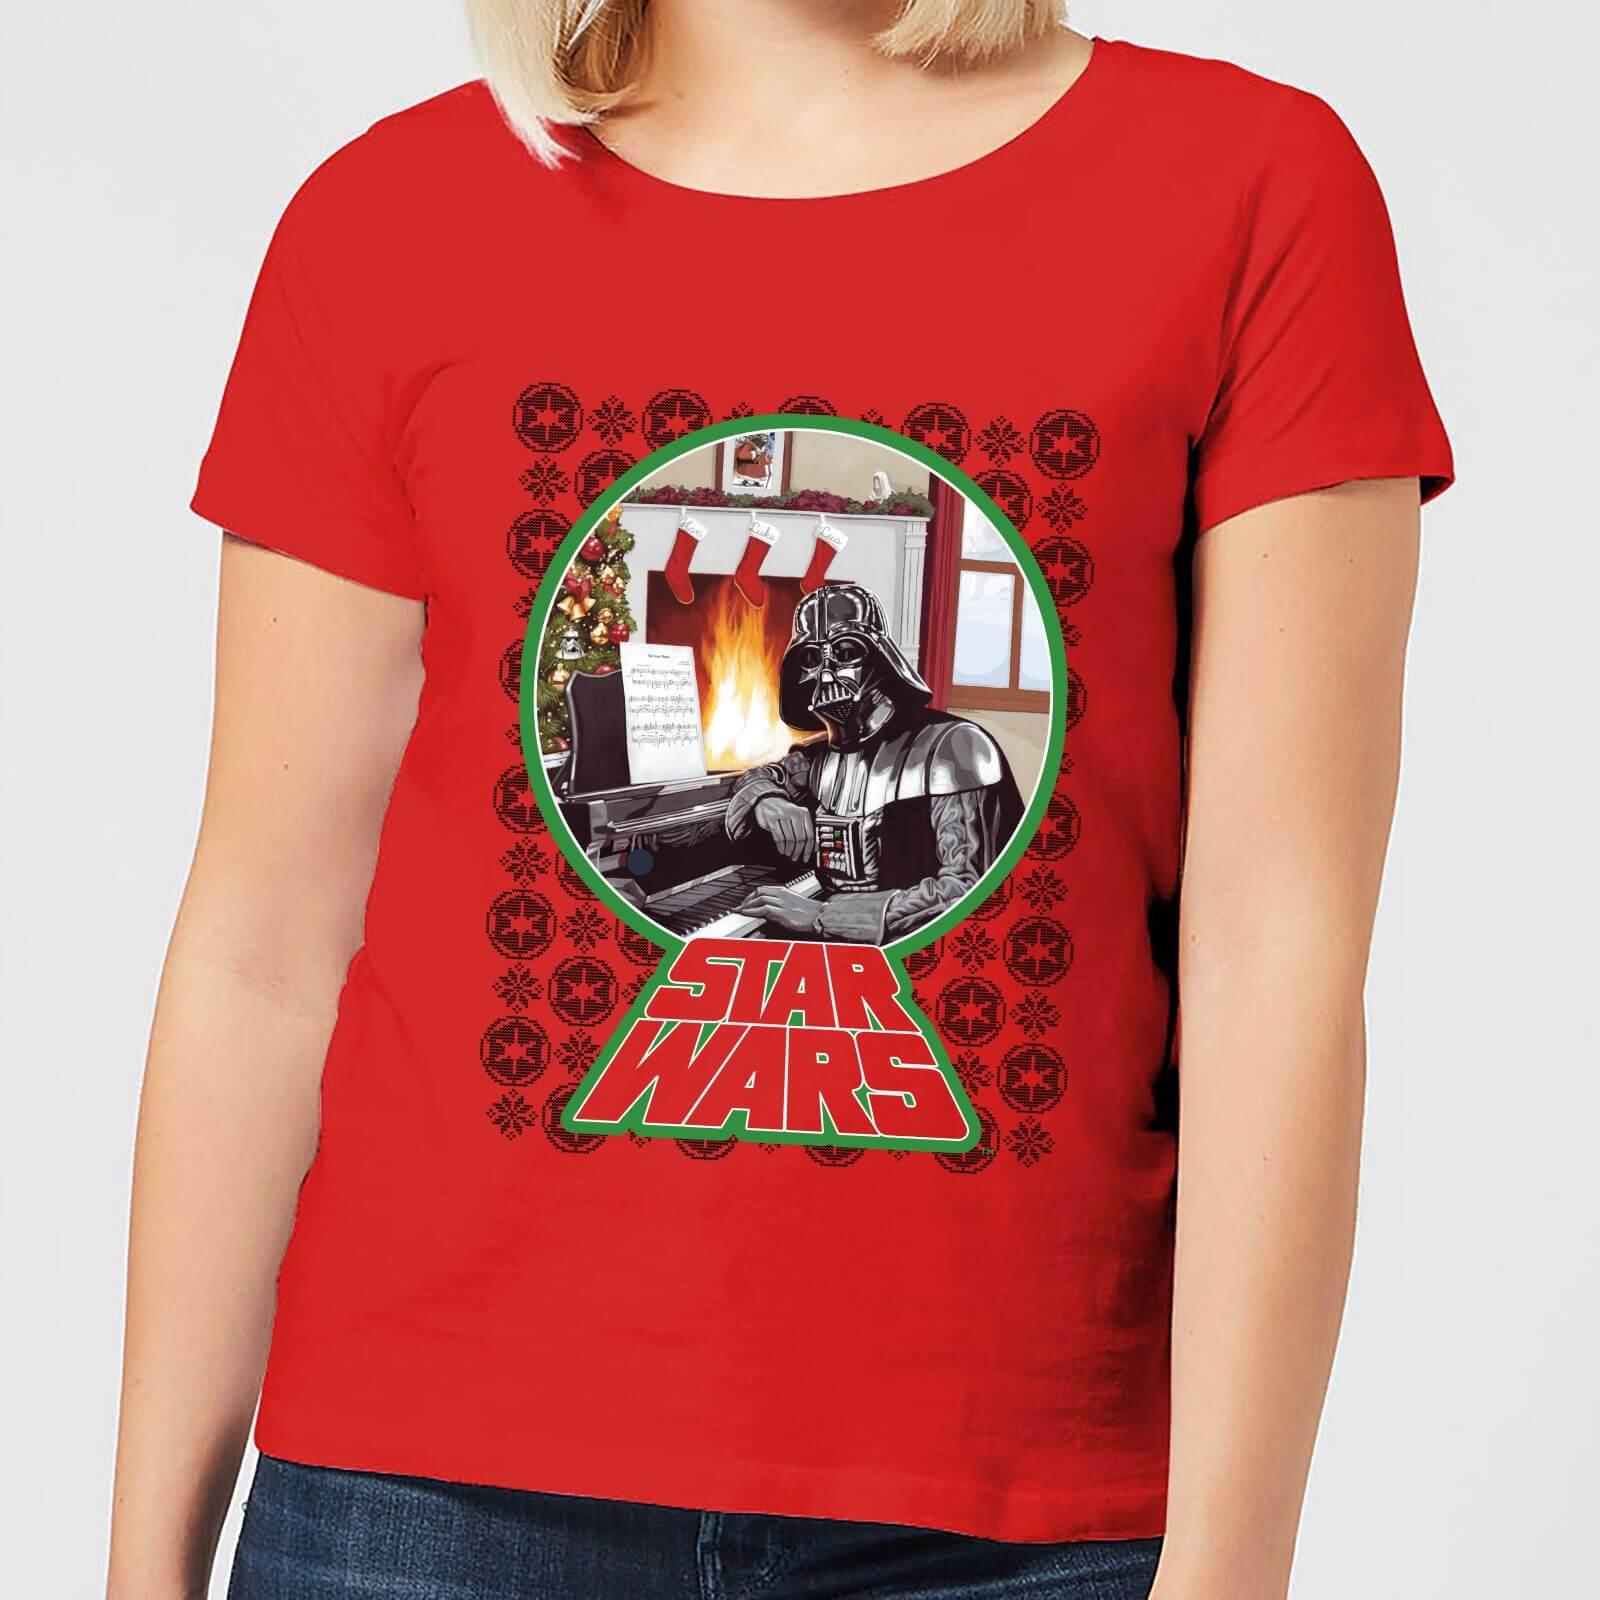 398546c8 Star Wars A Very Merry Sithmas Women's Christmas T-Shirt - Red Clothing |  Zavvi